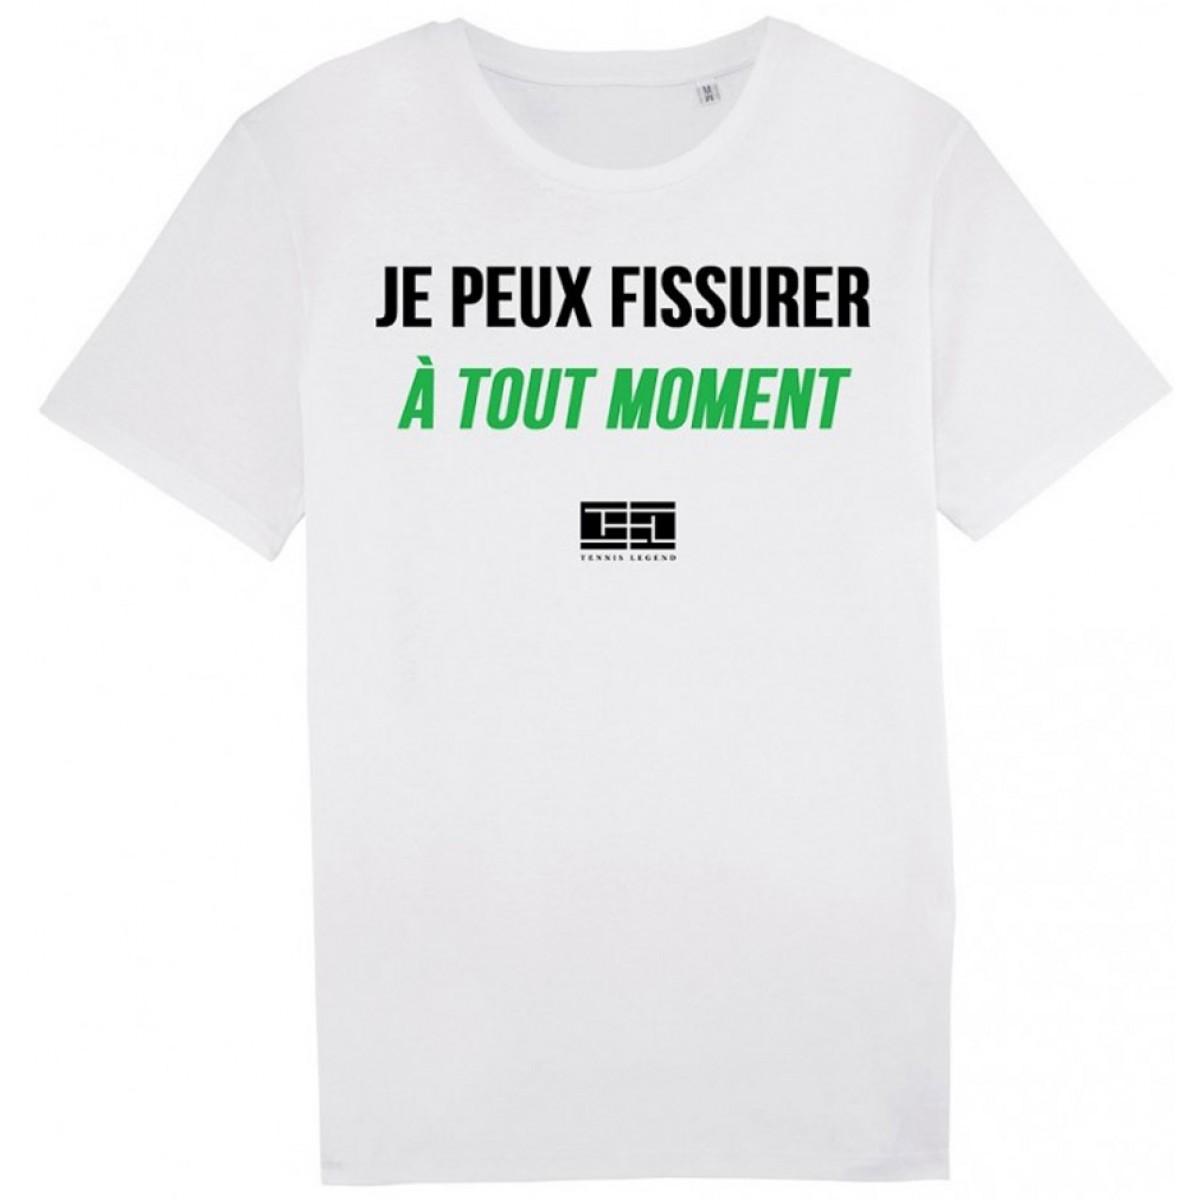 TENNIS LEGEND J'PEUX FISSURER T-SHIRT